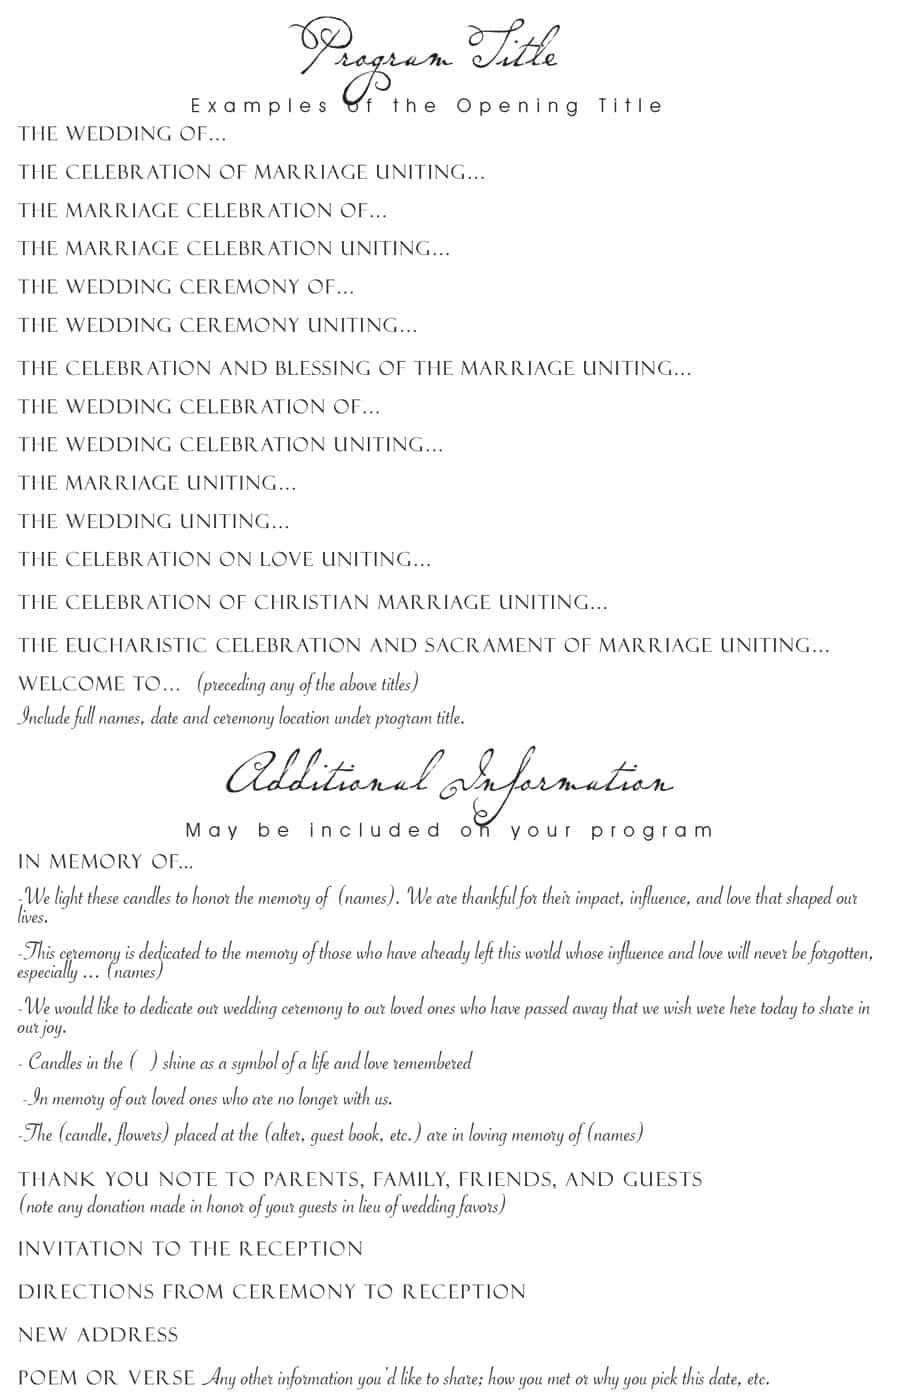 37 Printable Wedding Program Examples & Templates - Template Lab - Free Printable Wedding Program Templates